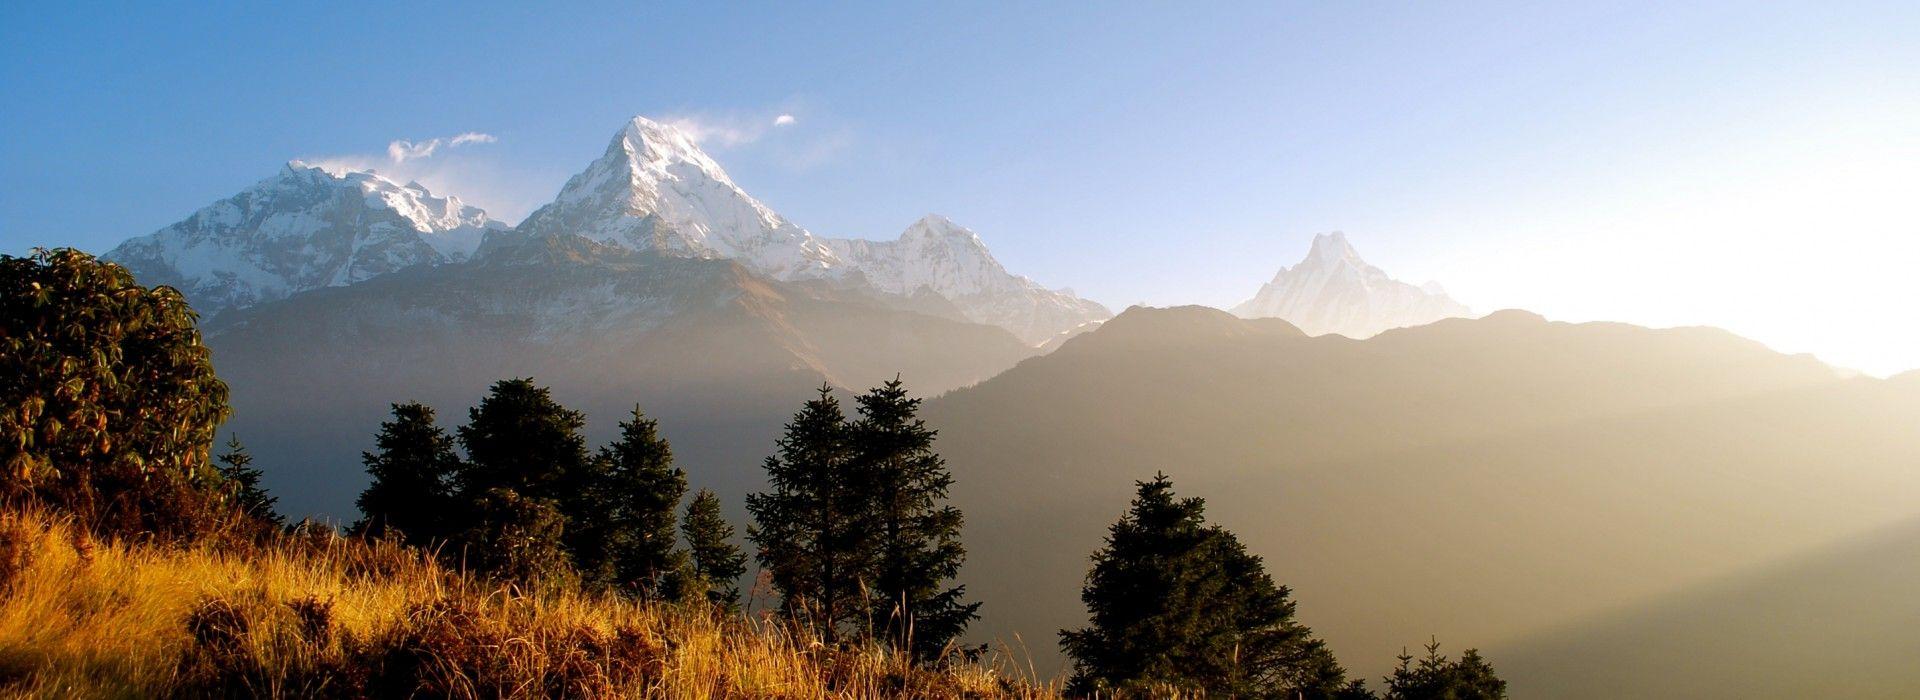 Trekking Tours in Pokhara